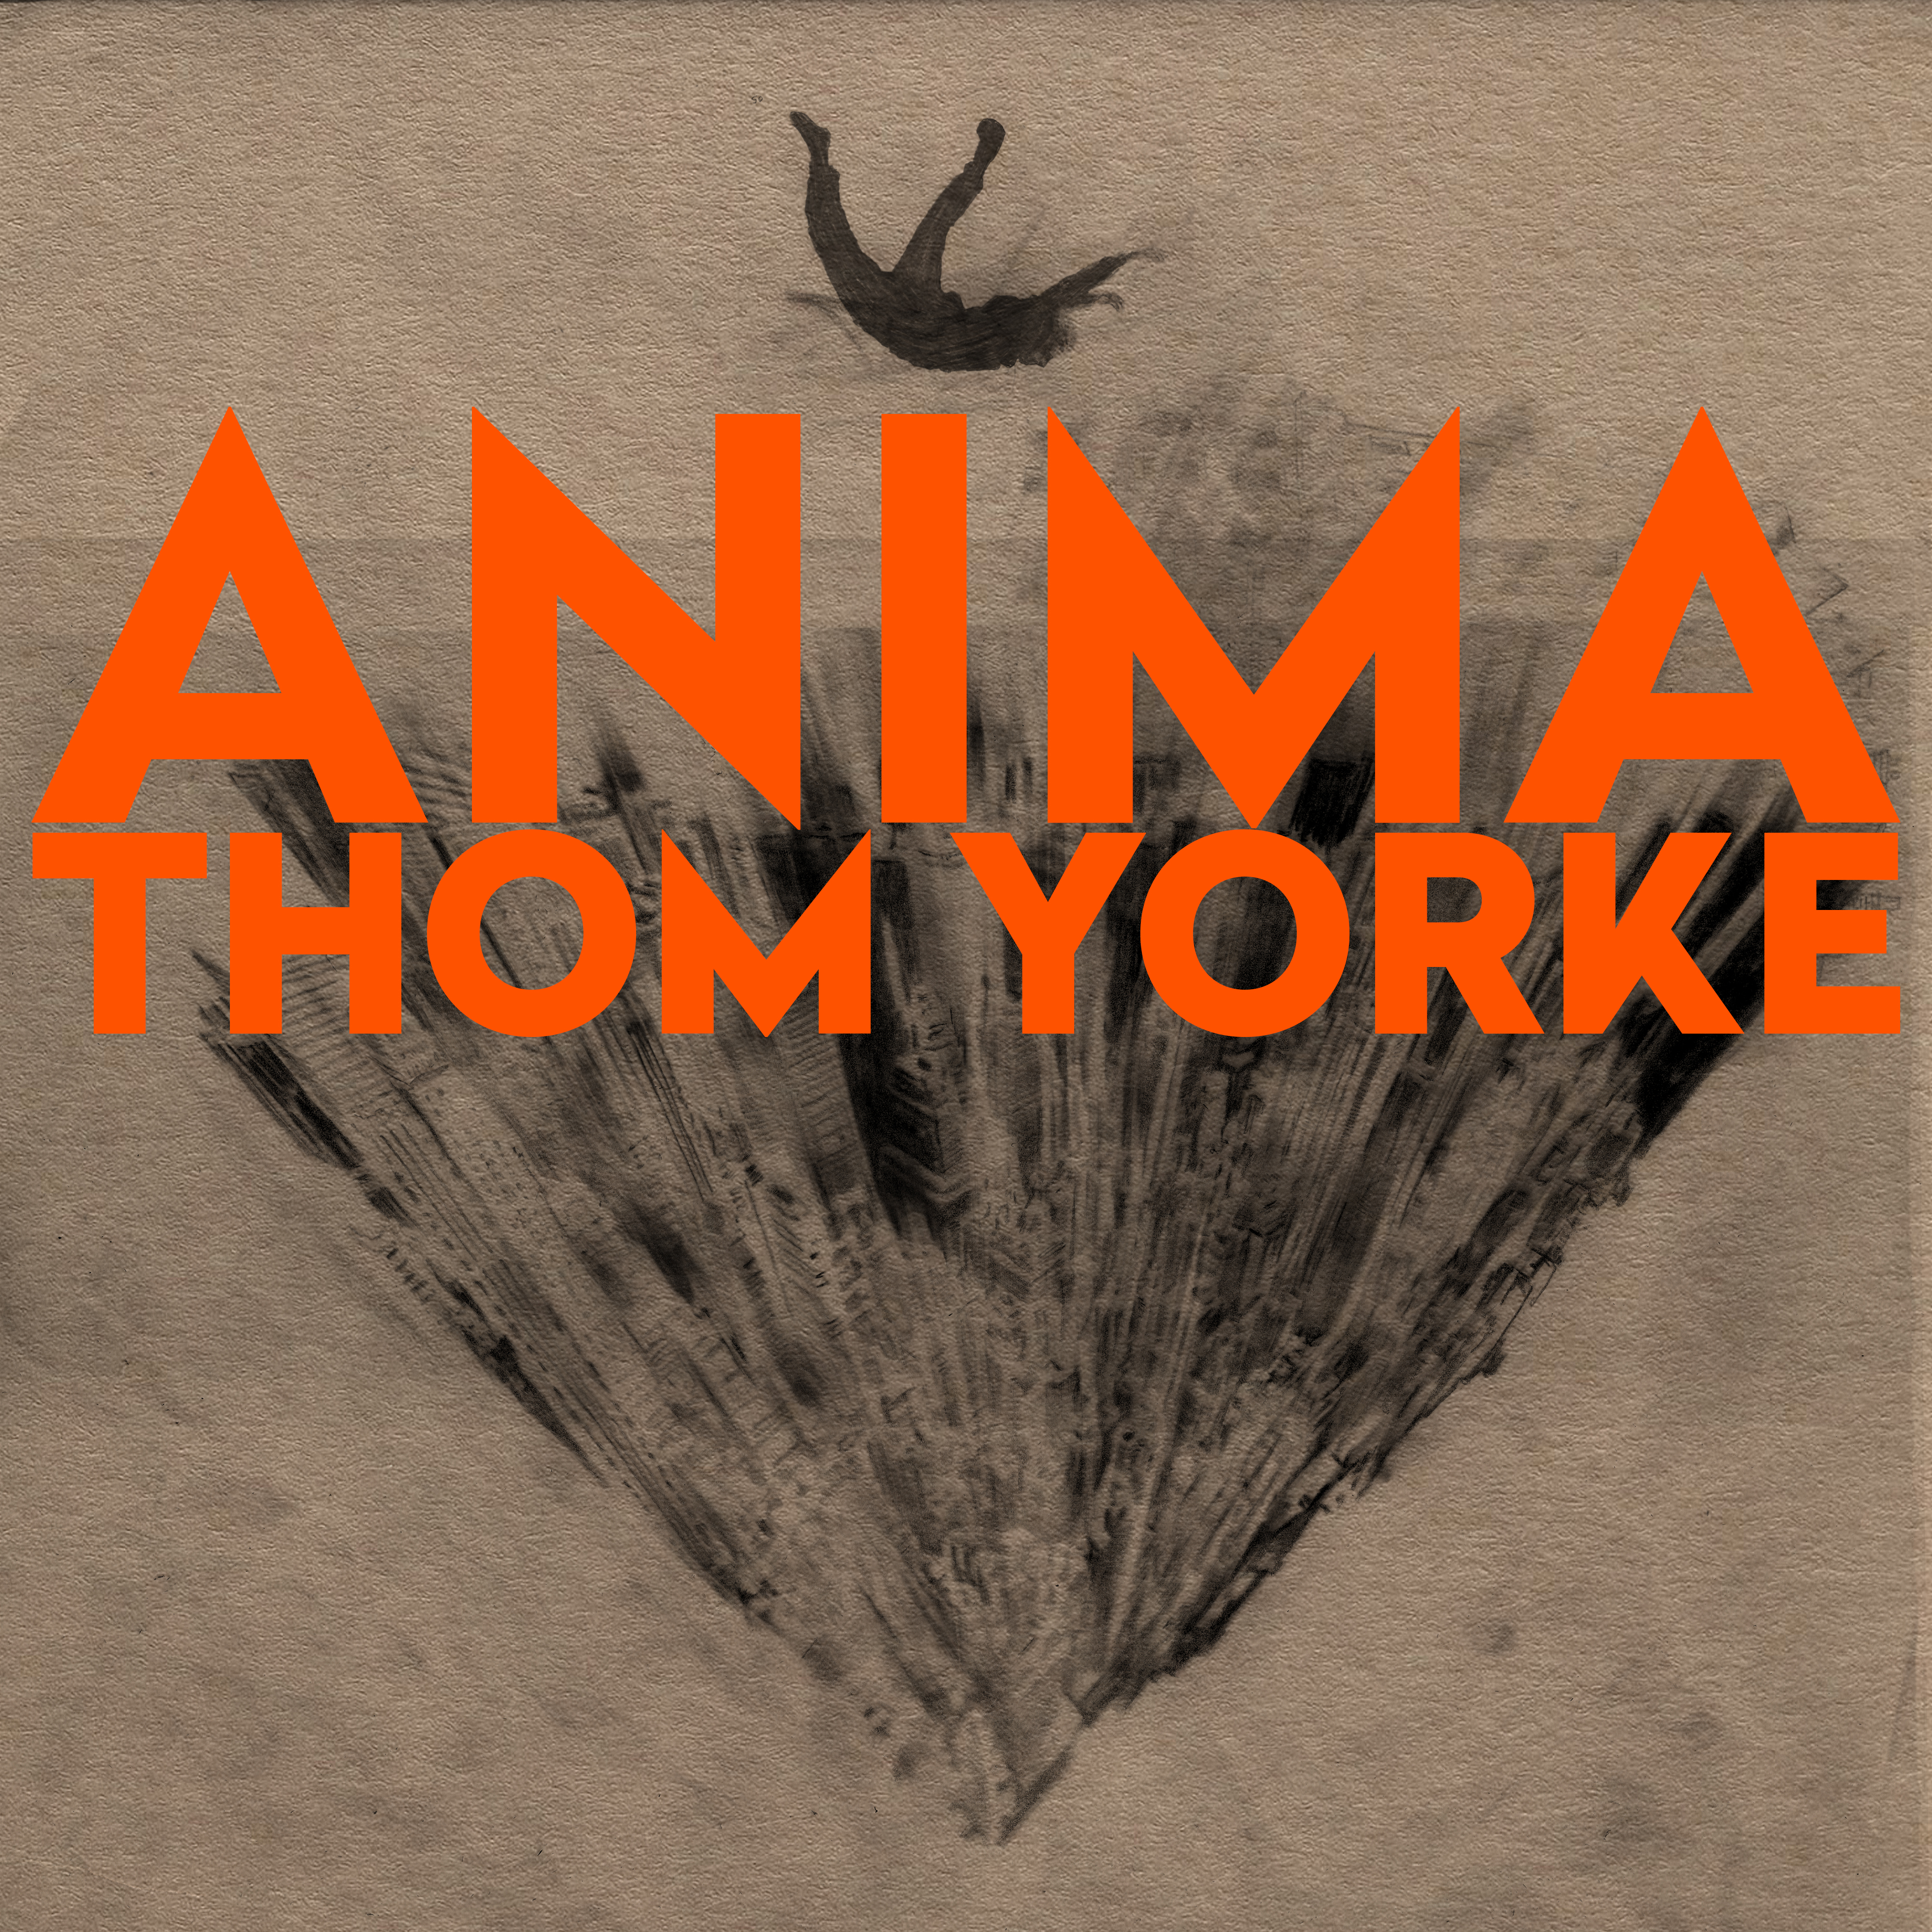 Thom Yorke announces new album ANIMA